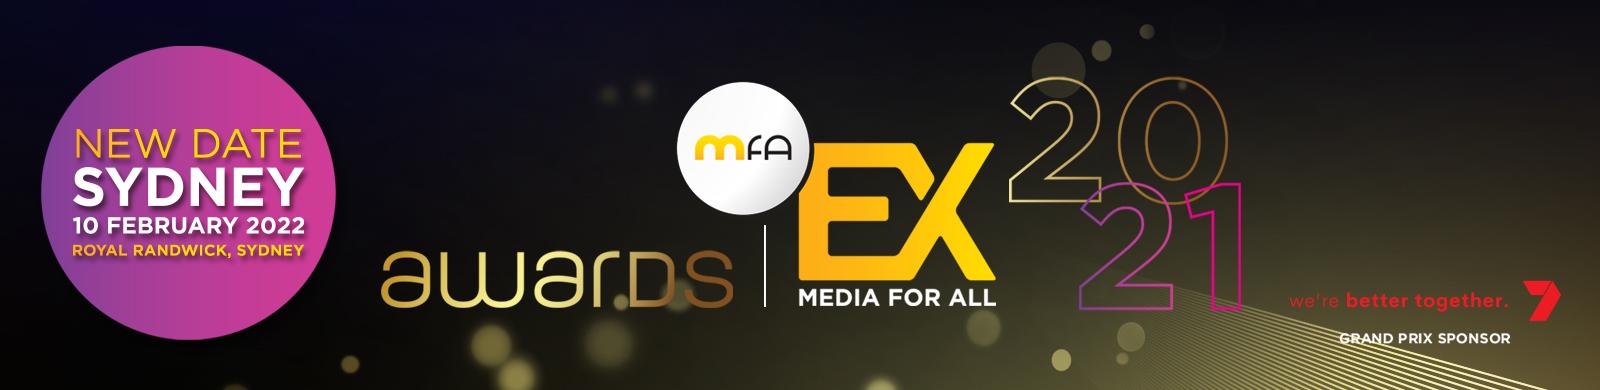 MFAExAwards21_WebsiteSlider_NewDateSYD2022_1600x390px